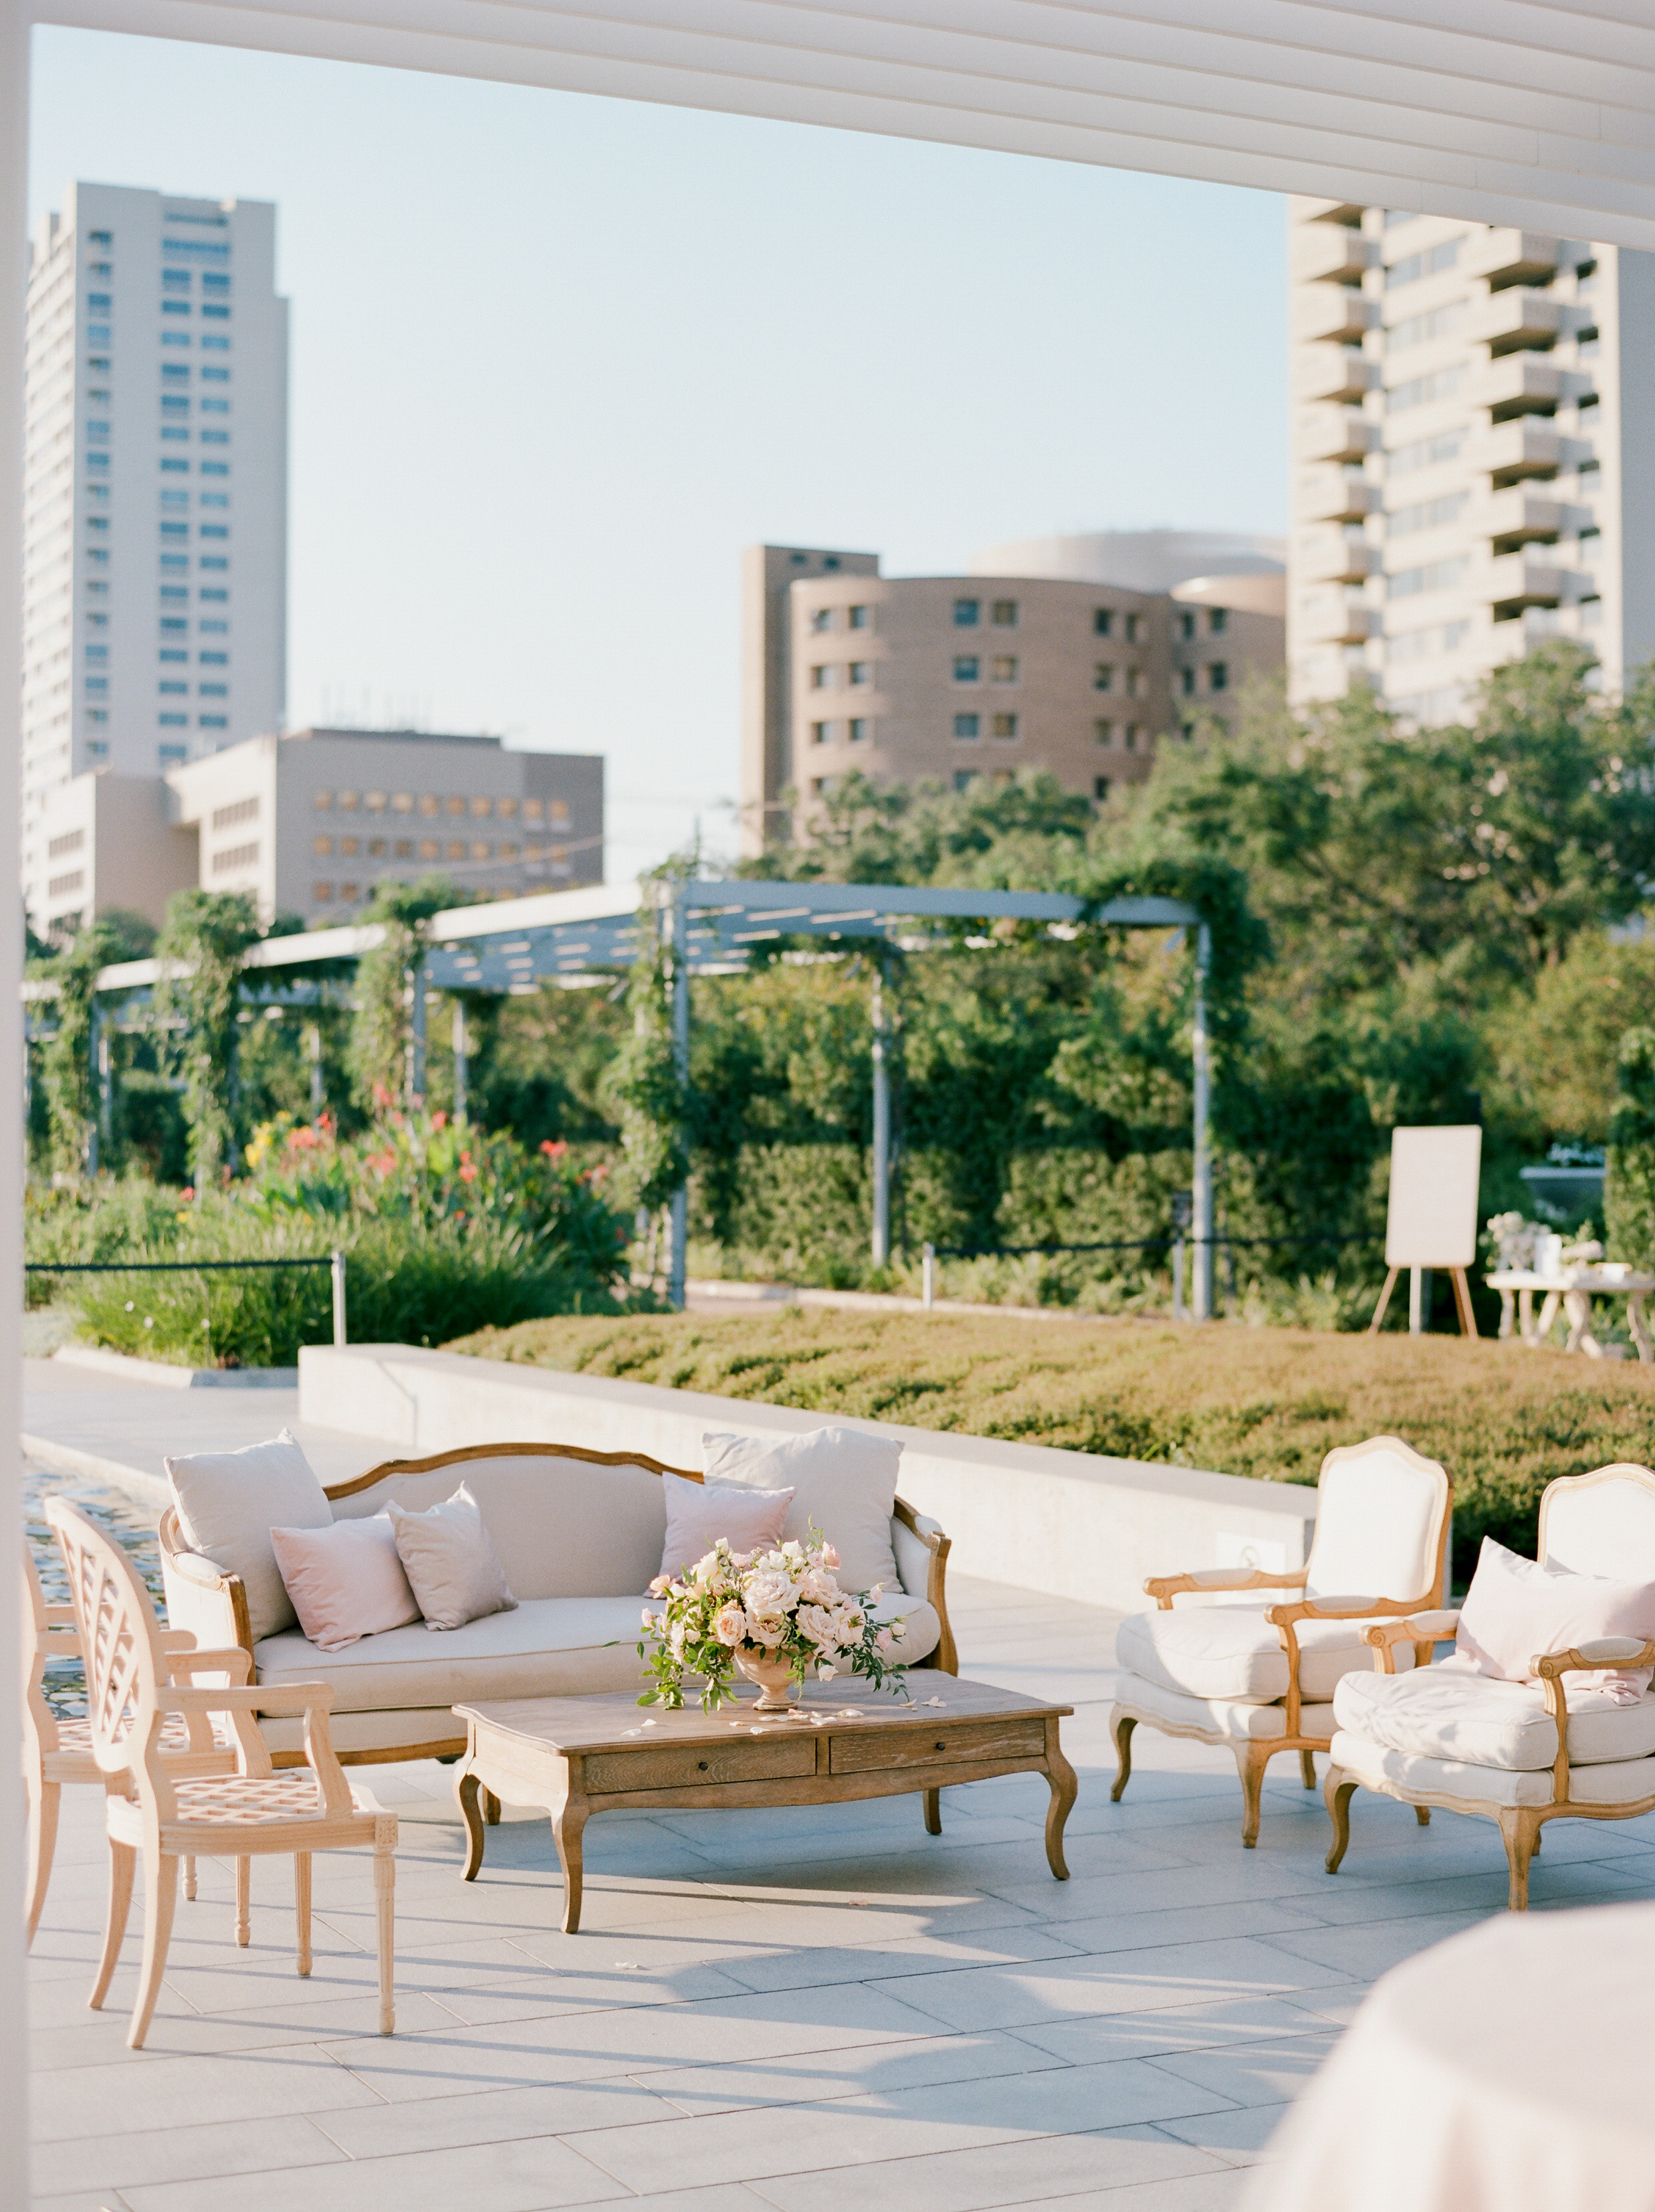 Martha-Stewart-Wedding-Dana-Fernandez-Photography-Josh-Texas-Film-Houston-Wedding-Fine-Art-Photographer-McGovern-Centennial-Gardens-Top-Best-84.jpg